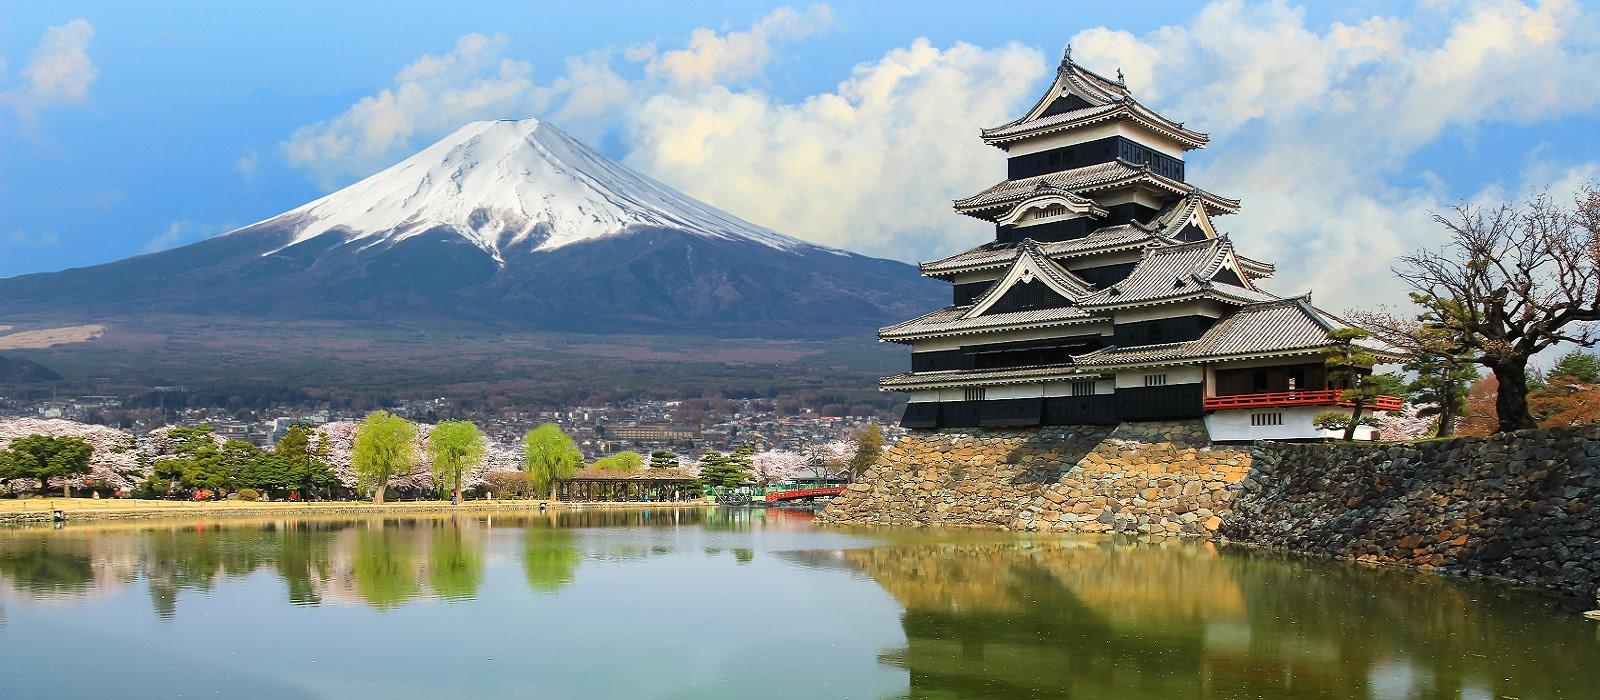 Reiseziel Matsumoto Japan